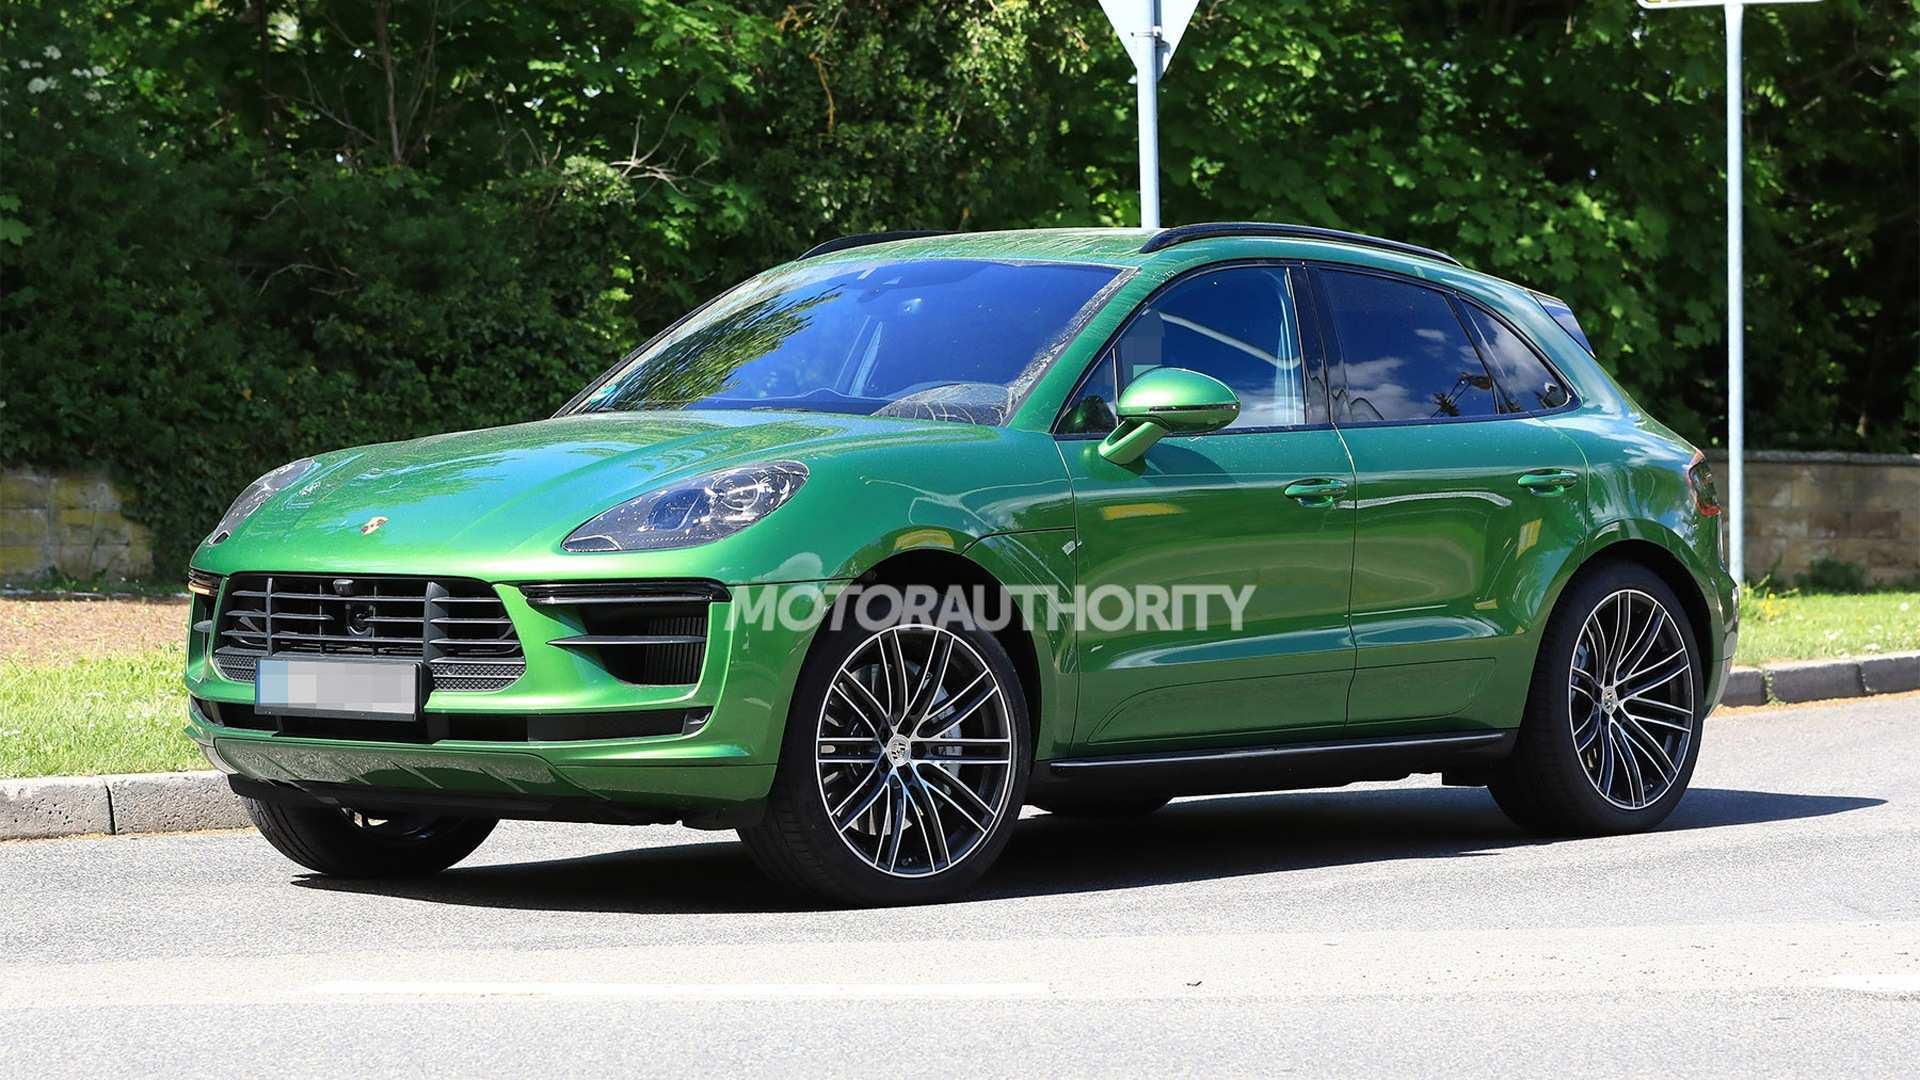 69 New 2019 Porsche Macan Release Date Specs by 2019 Porsche Macan Release Date